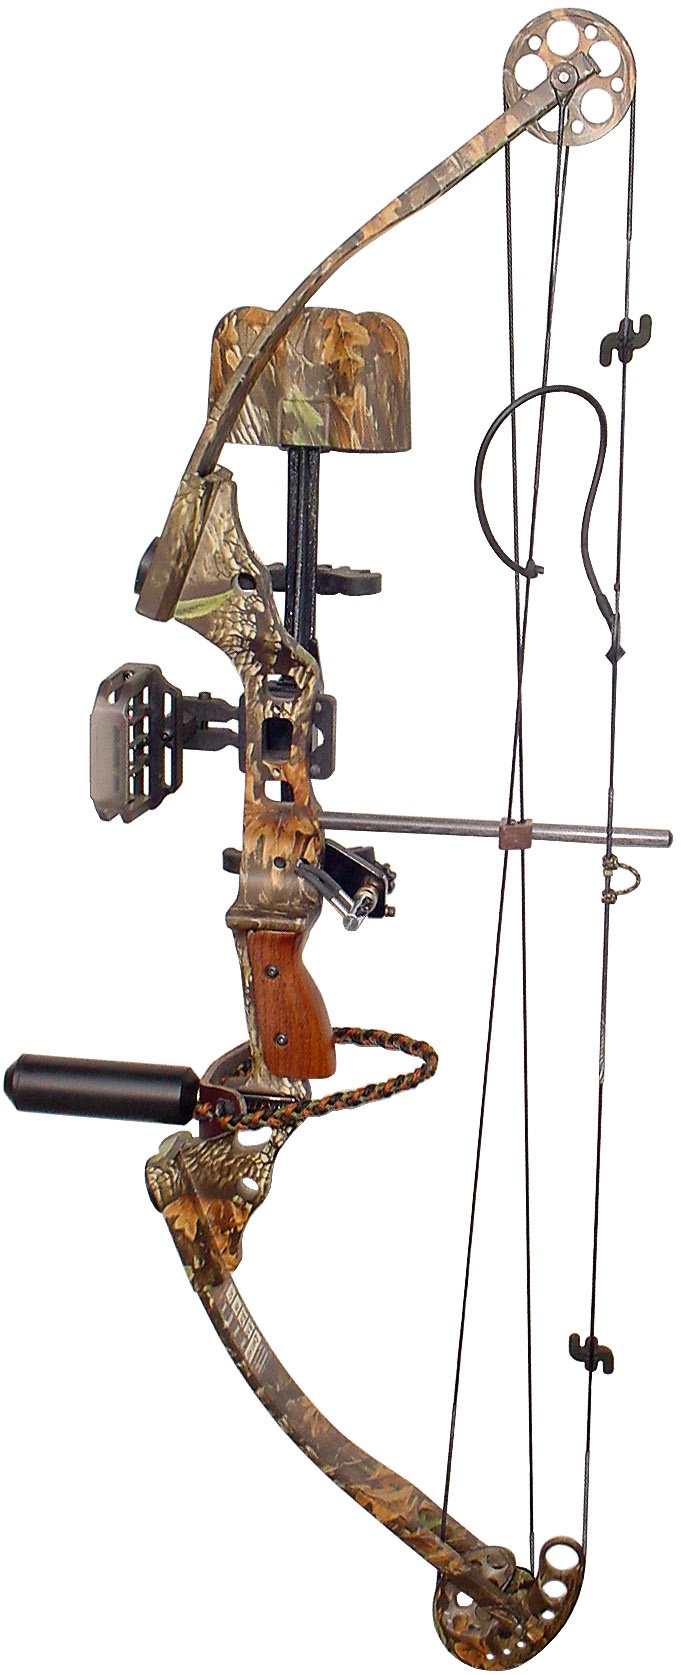 Pin By The Heritage Guild On Parker Bows Archery Shop Archery Archery Store